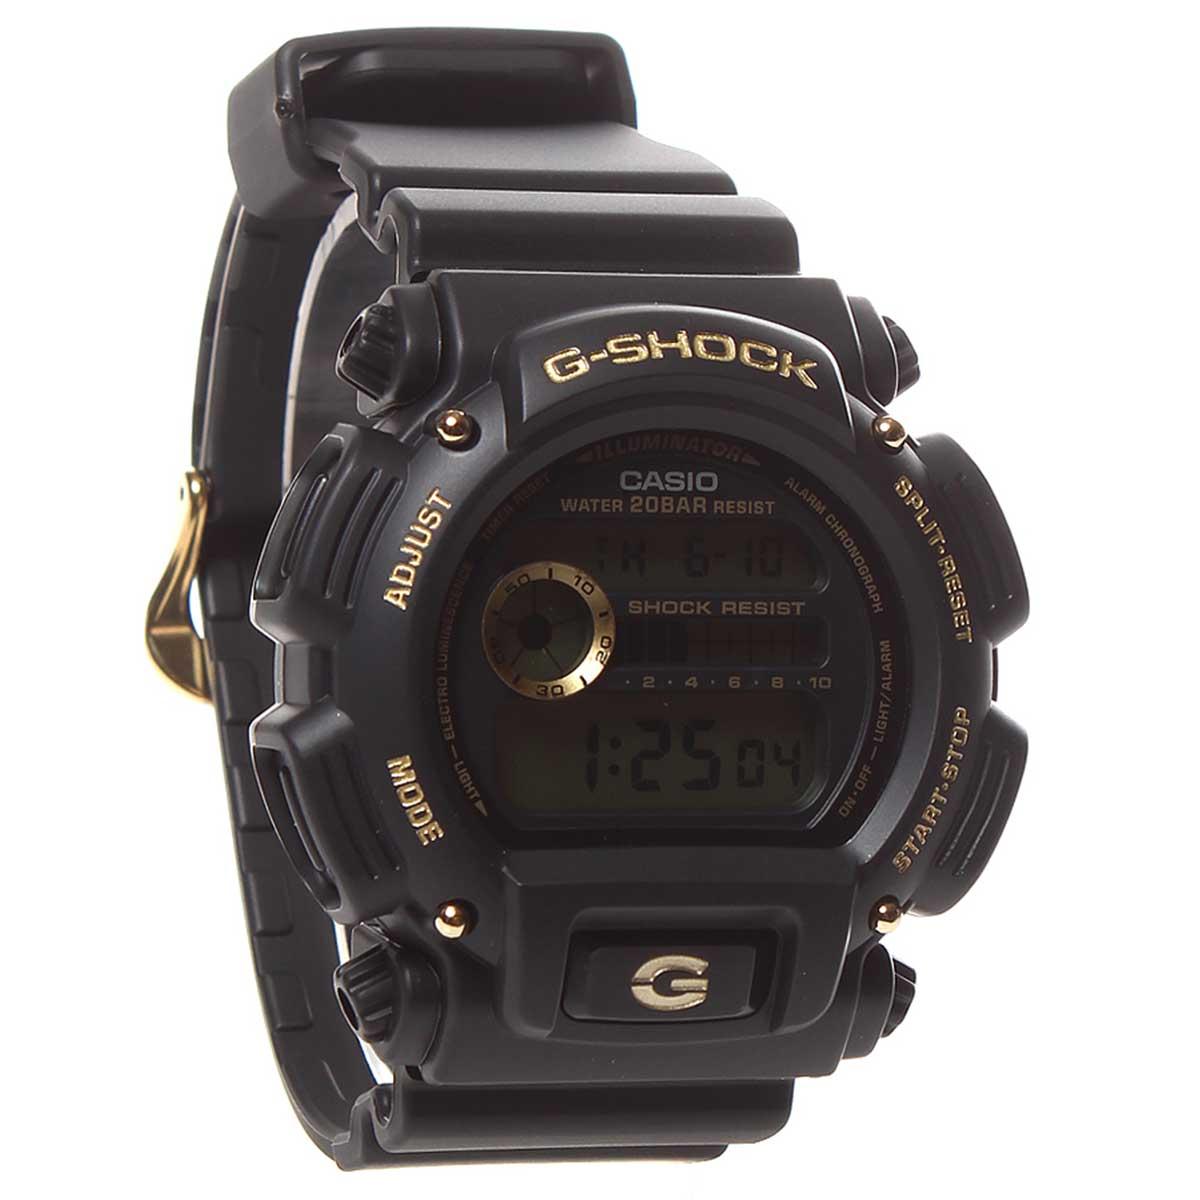 Relógio de Pulso Casio G-Shock Modelo DW-9052GBX-1A9DR